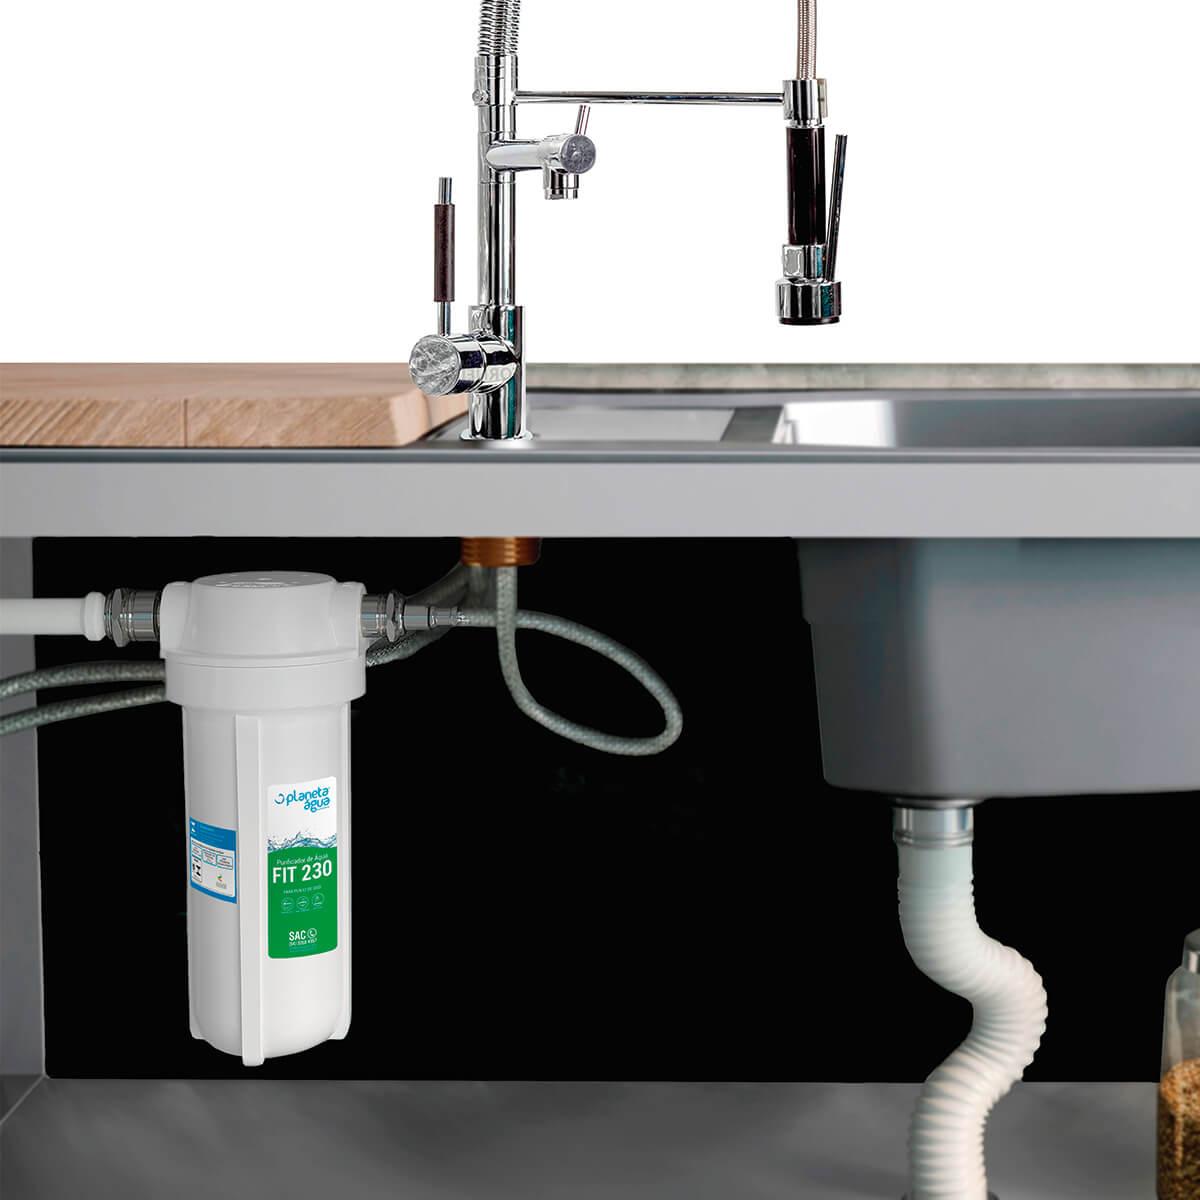 Filtro Purificador De Água Fit230 9